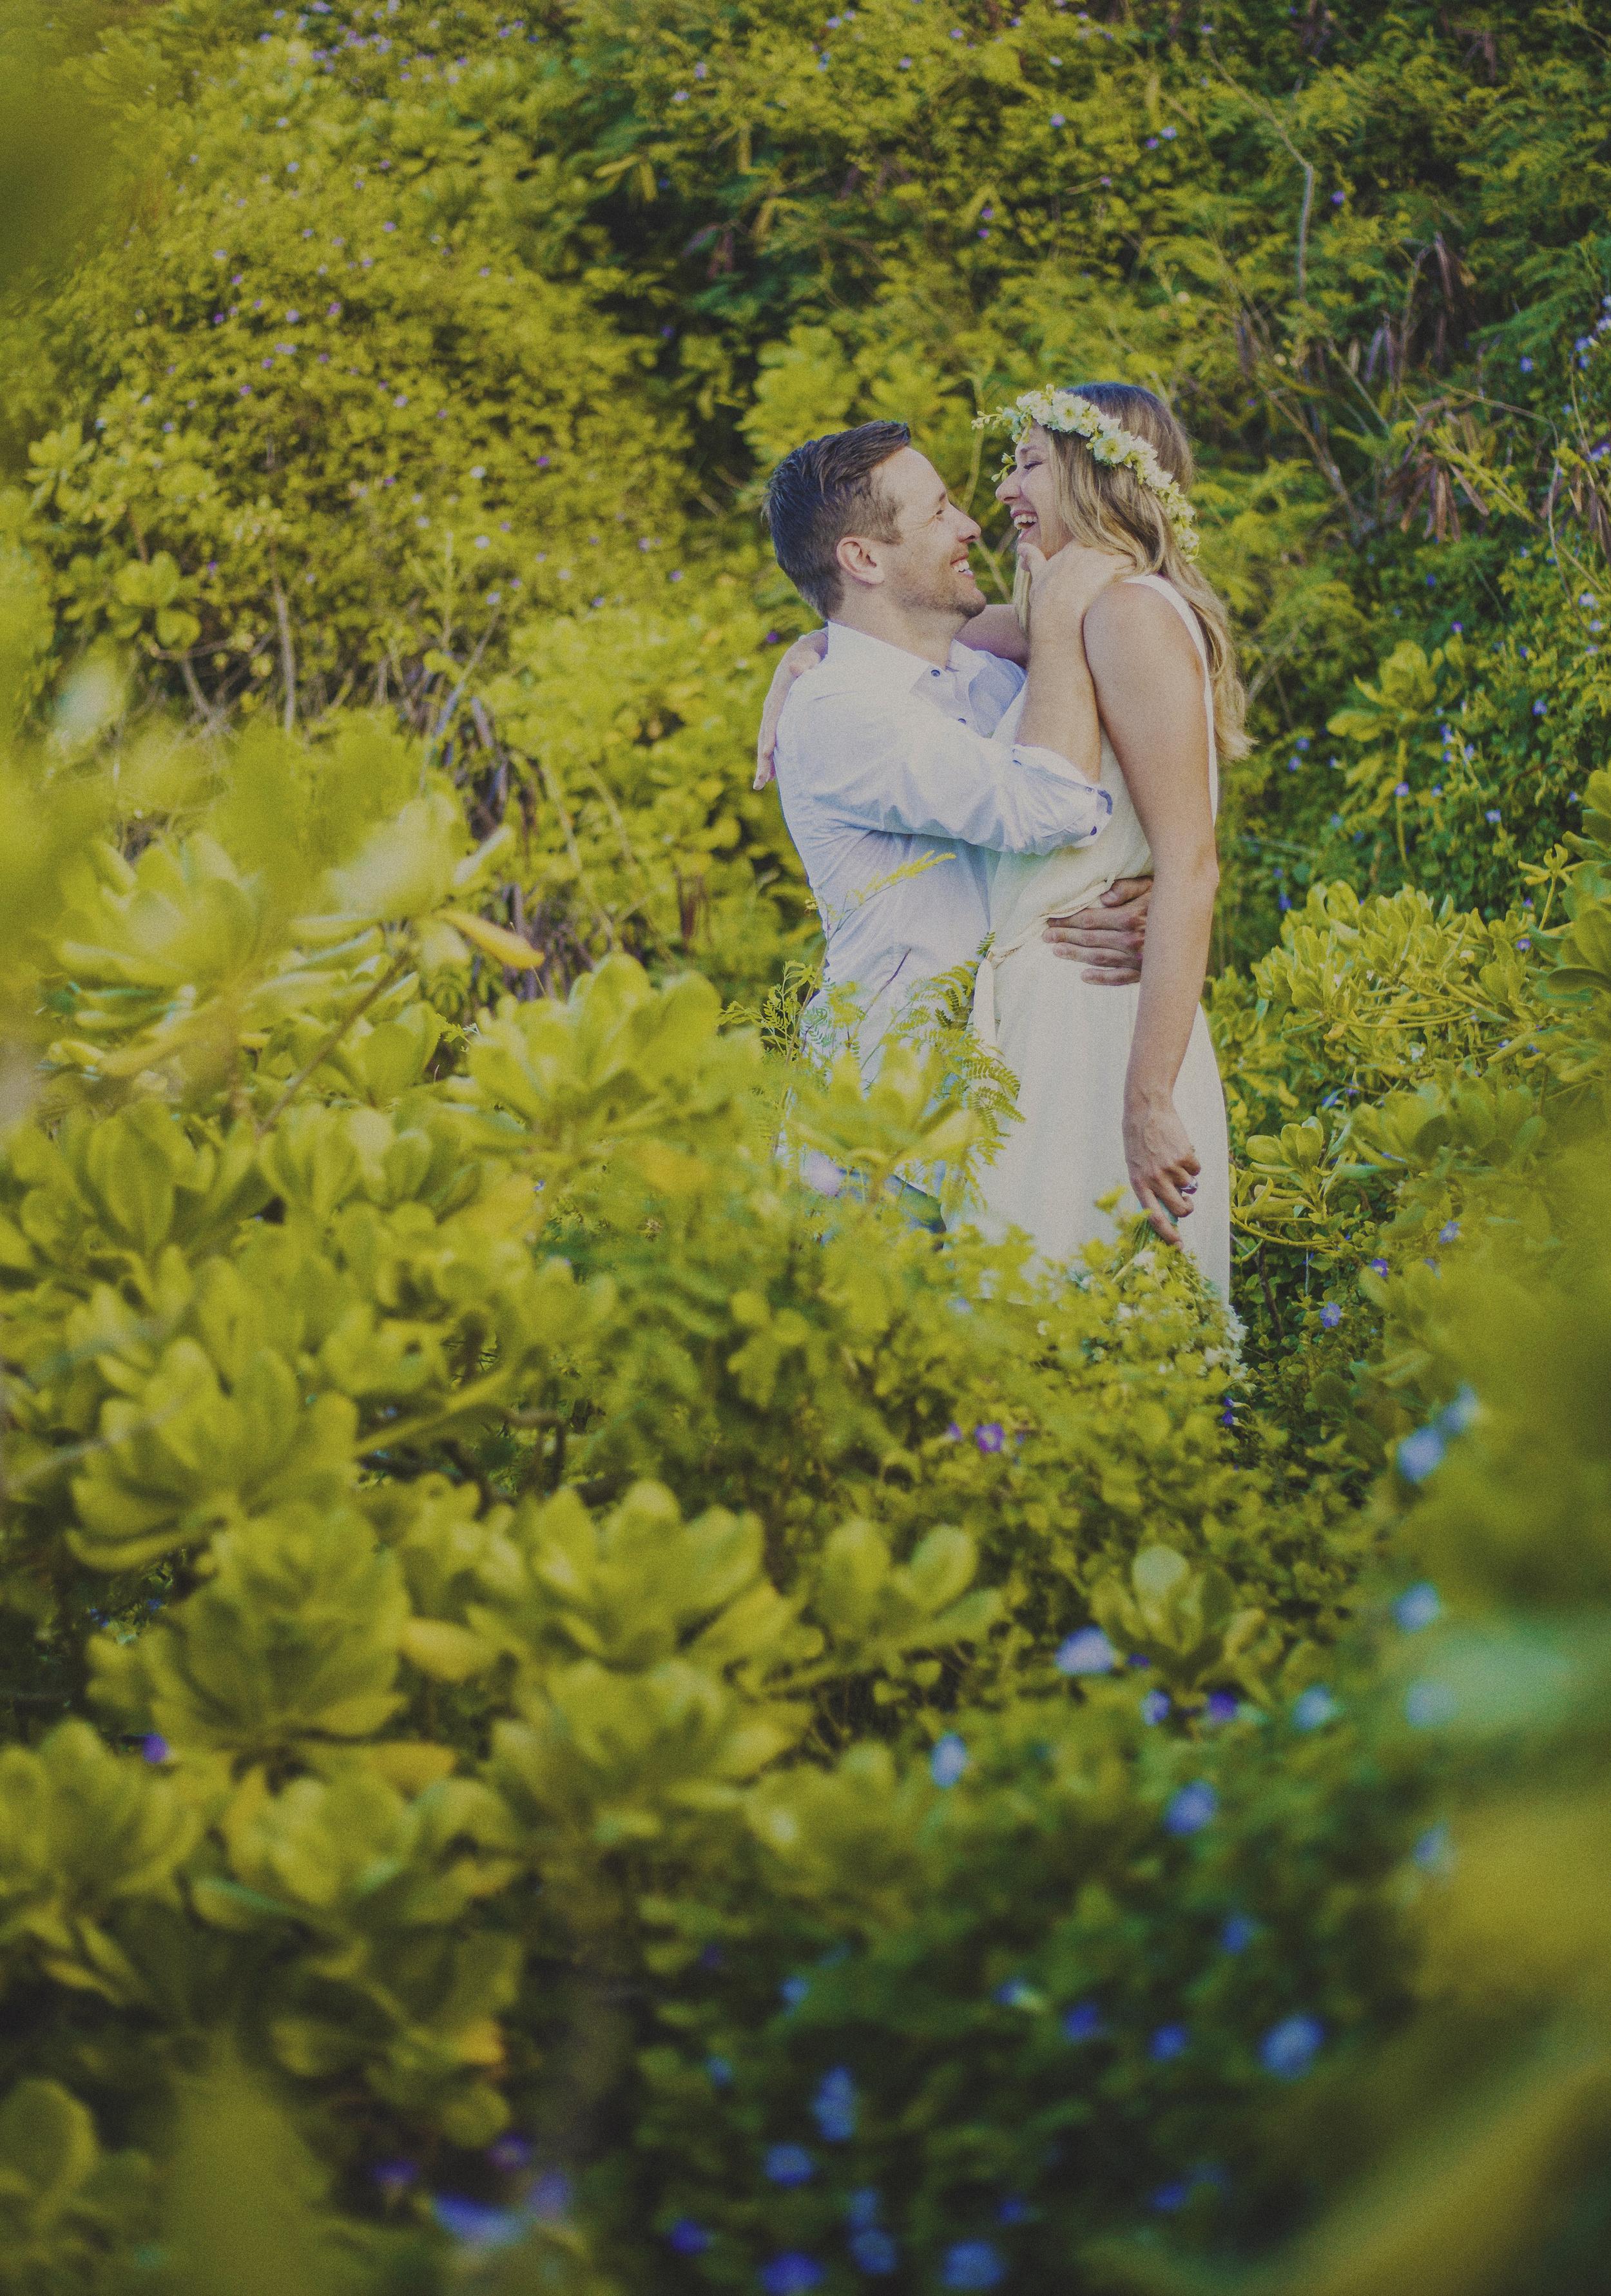 angie-diaz-photography-maui-elopement-oneloa-ironwoods-beach-22.jpg